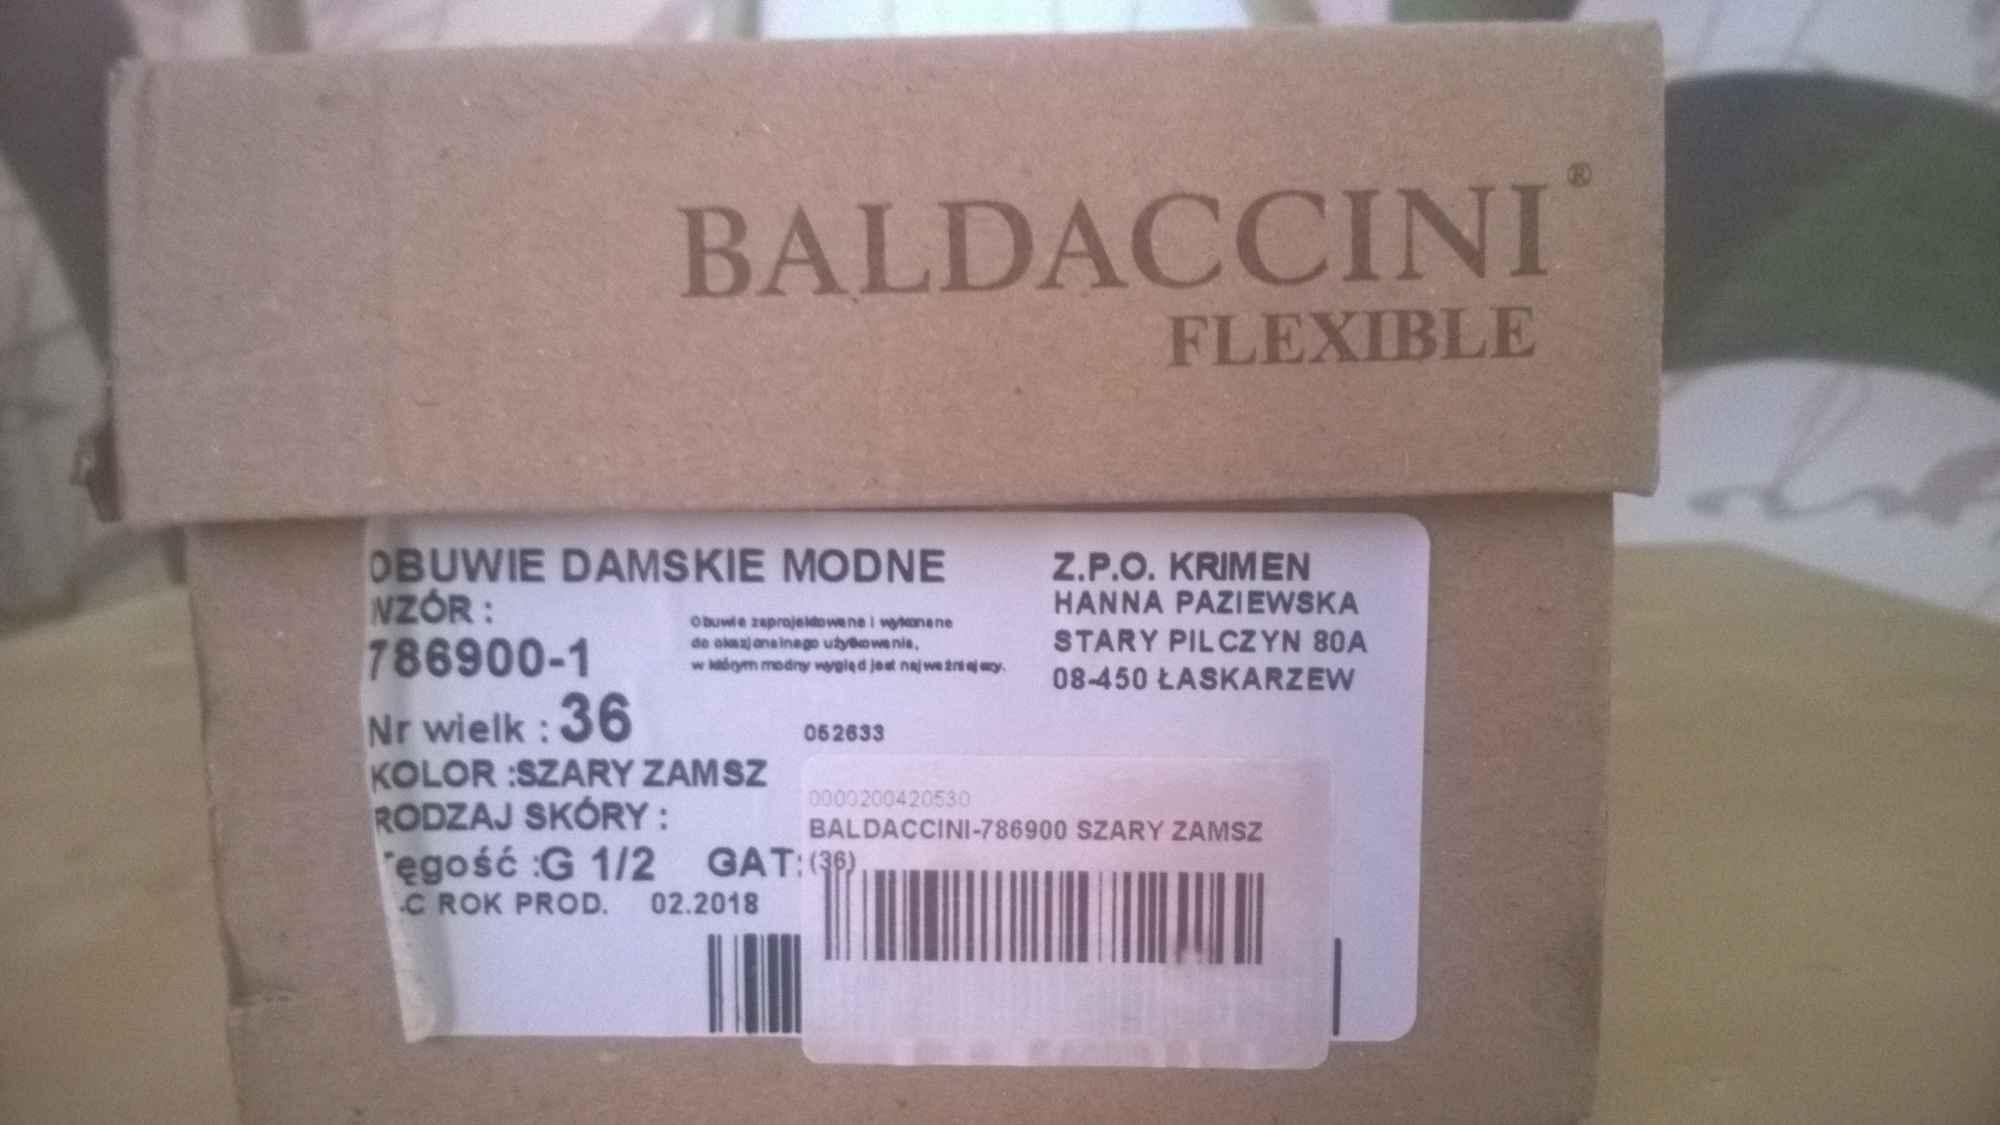 Baleriny Baldaccini Nowe r. 36 Grunwald - zdjęcie 4